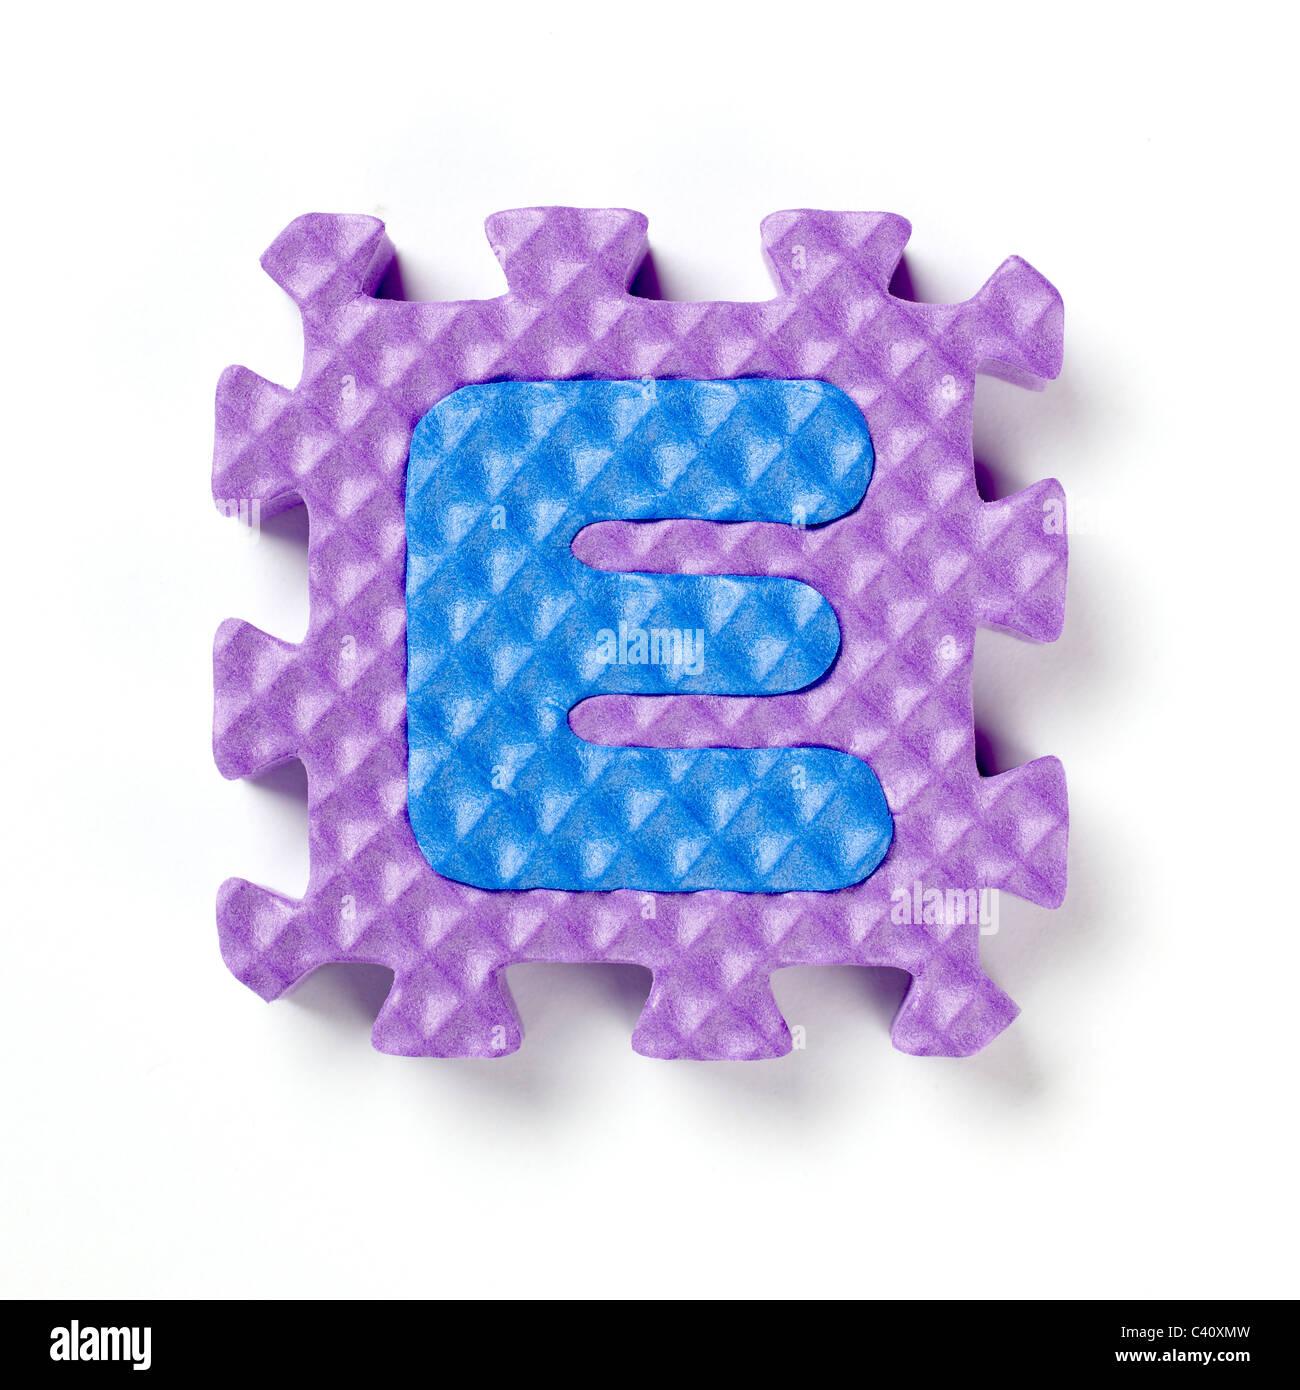 E alphabet stock photos e alphabet stock images alamy alphabet puzzle piece e stock image thecheapjerseys Choice Image